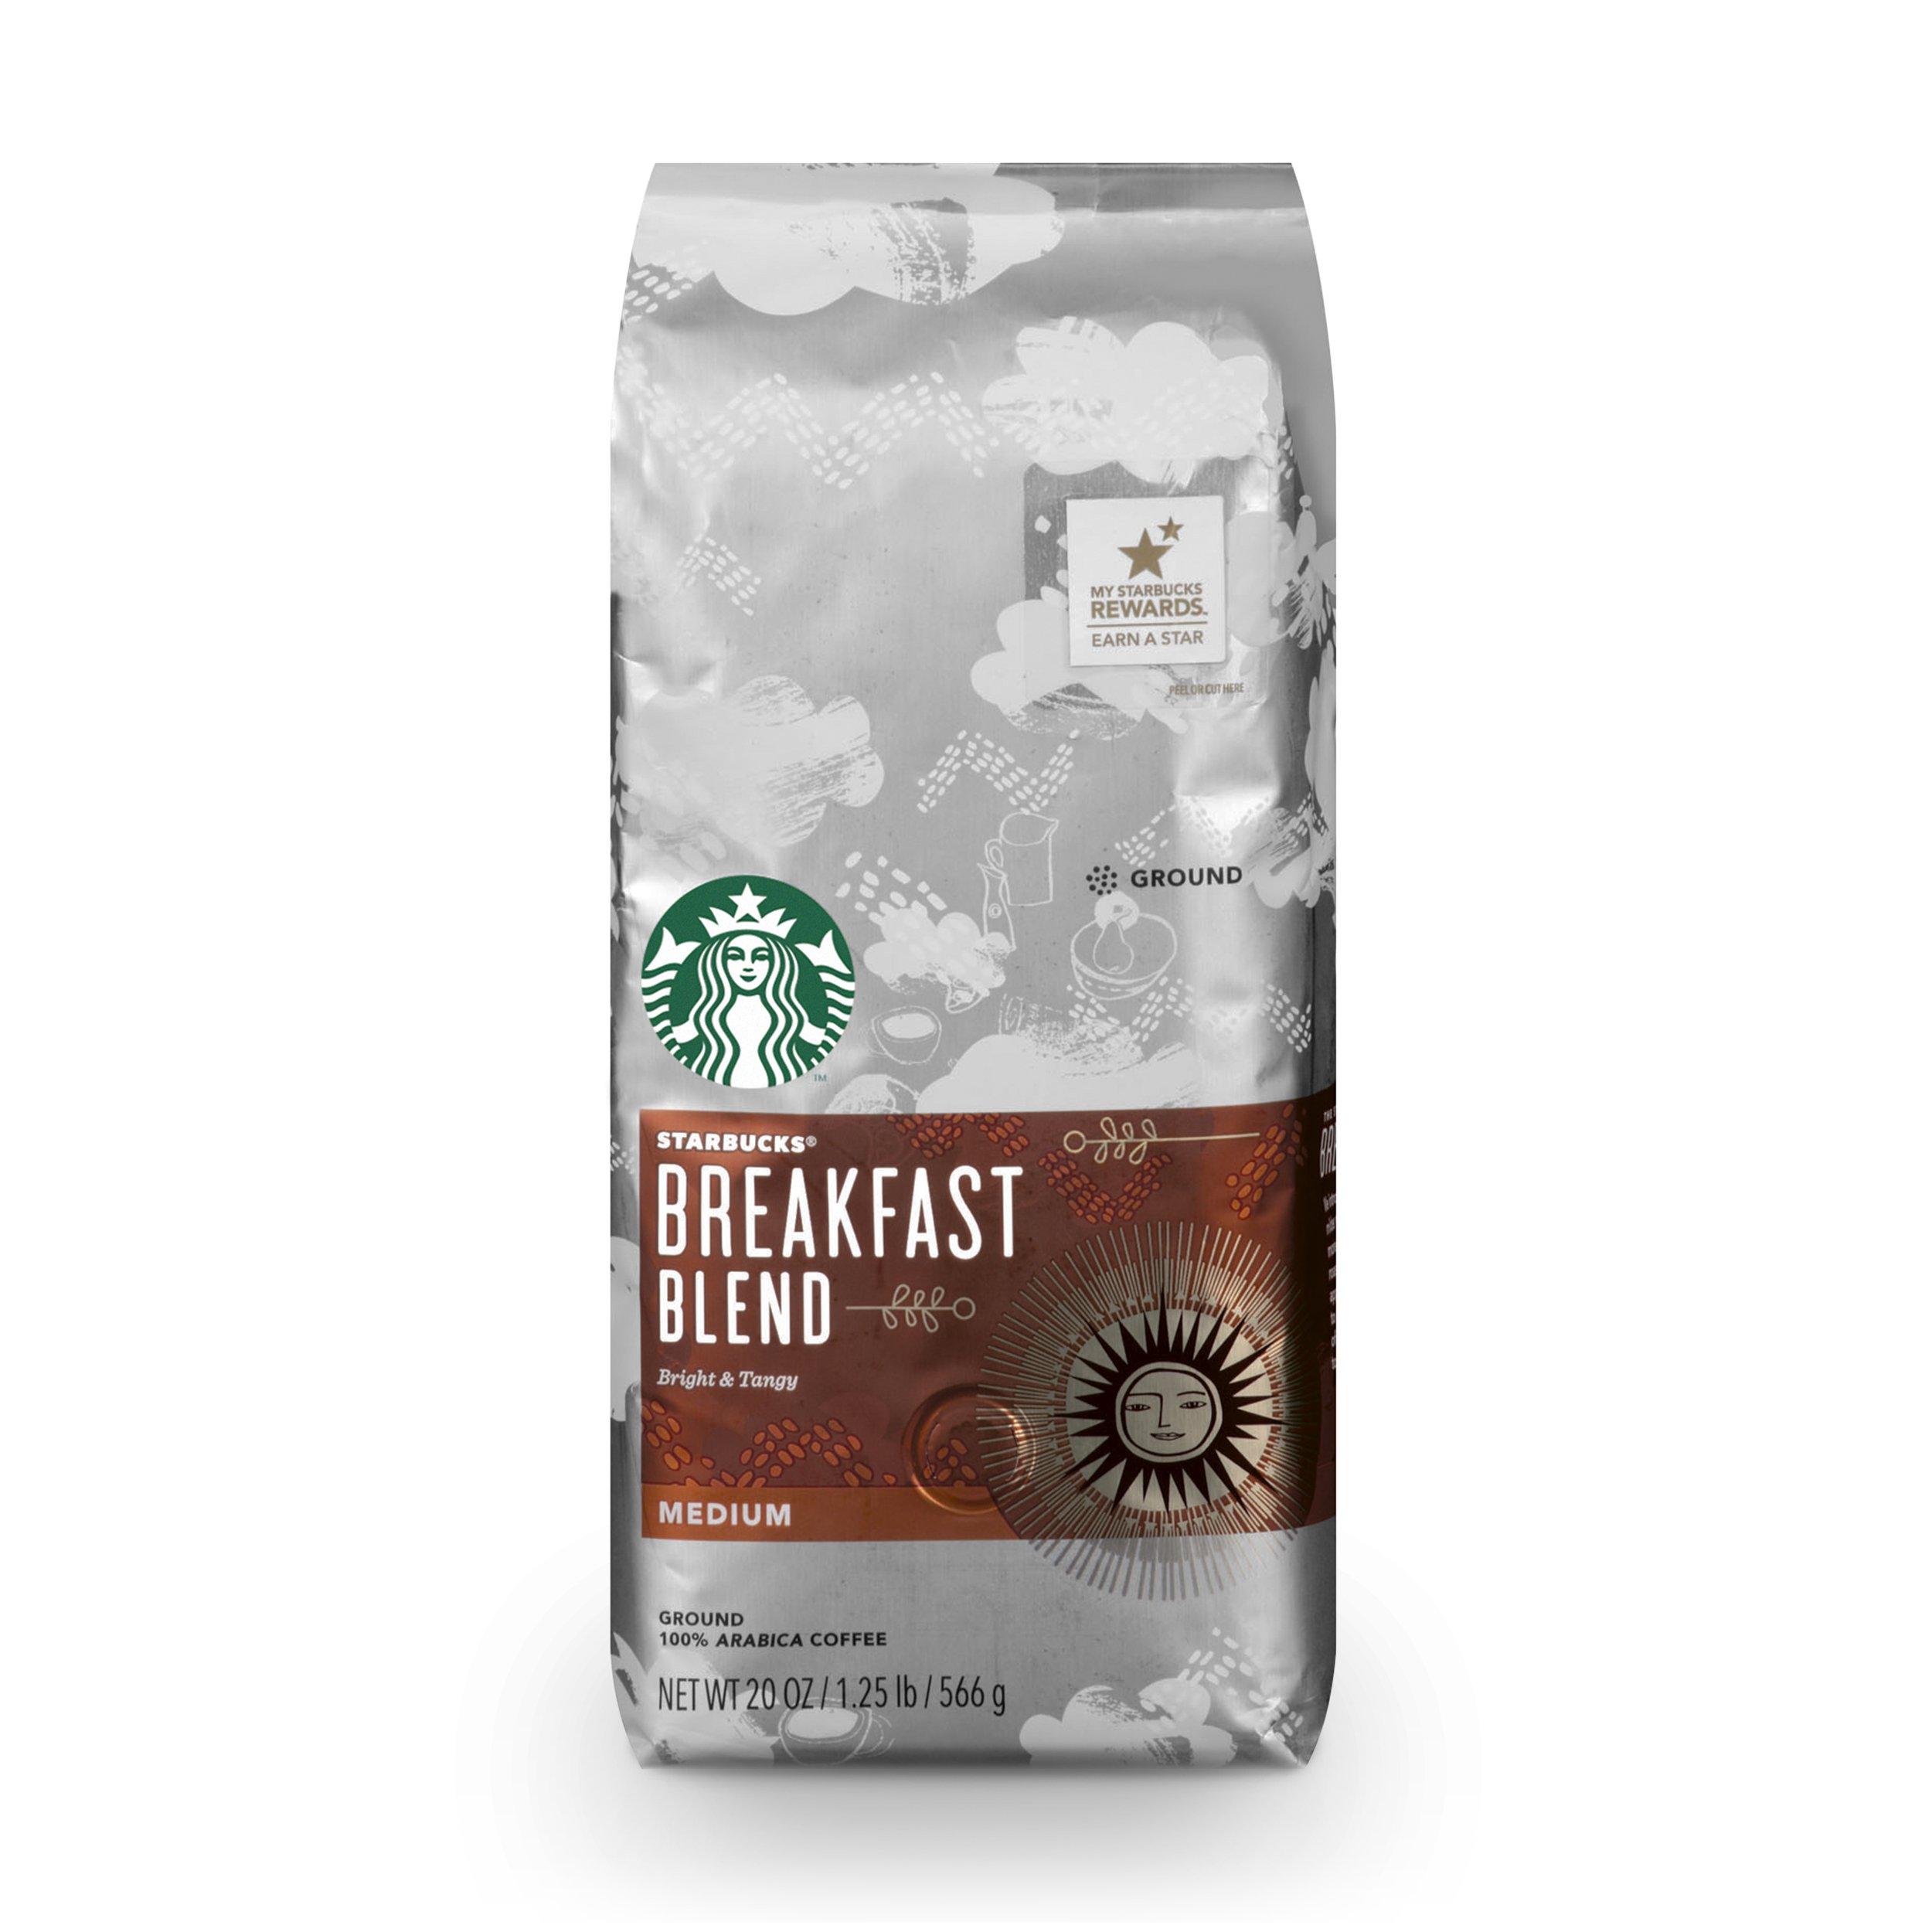 Starbucks House Blend Ground 20oz $5.42 Amazon Add-on